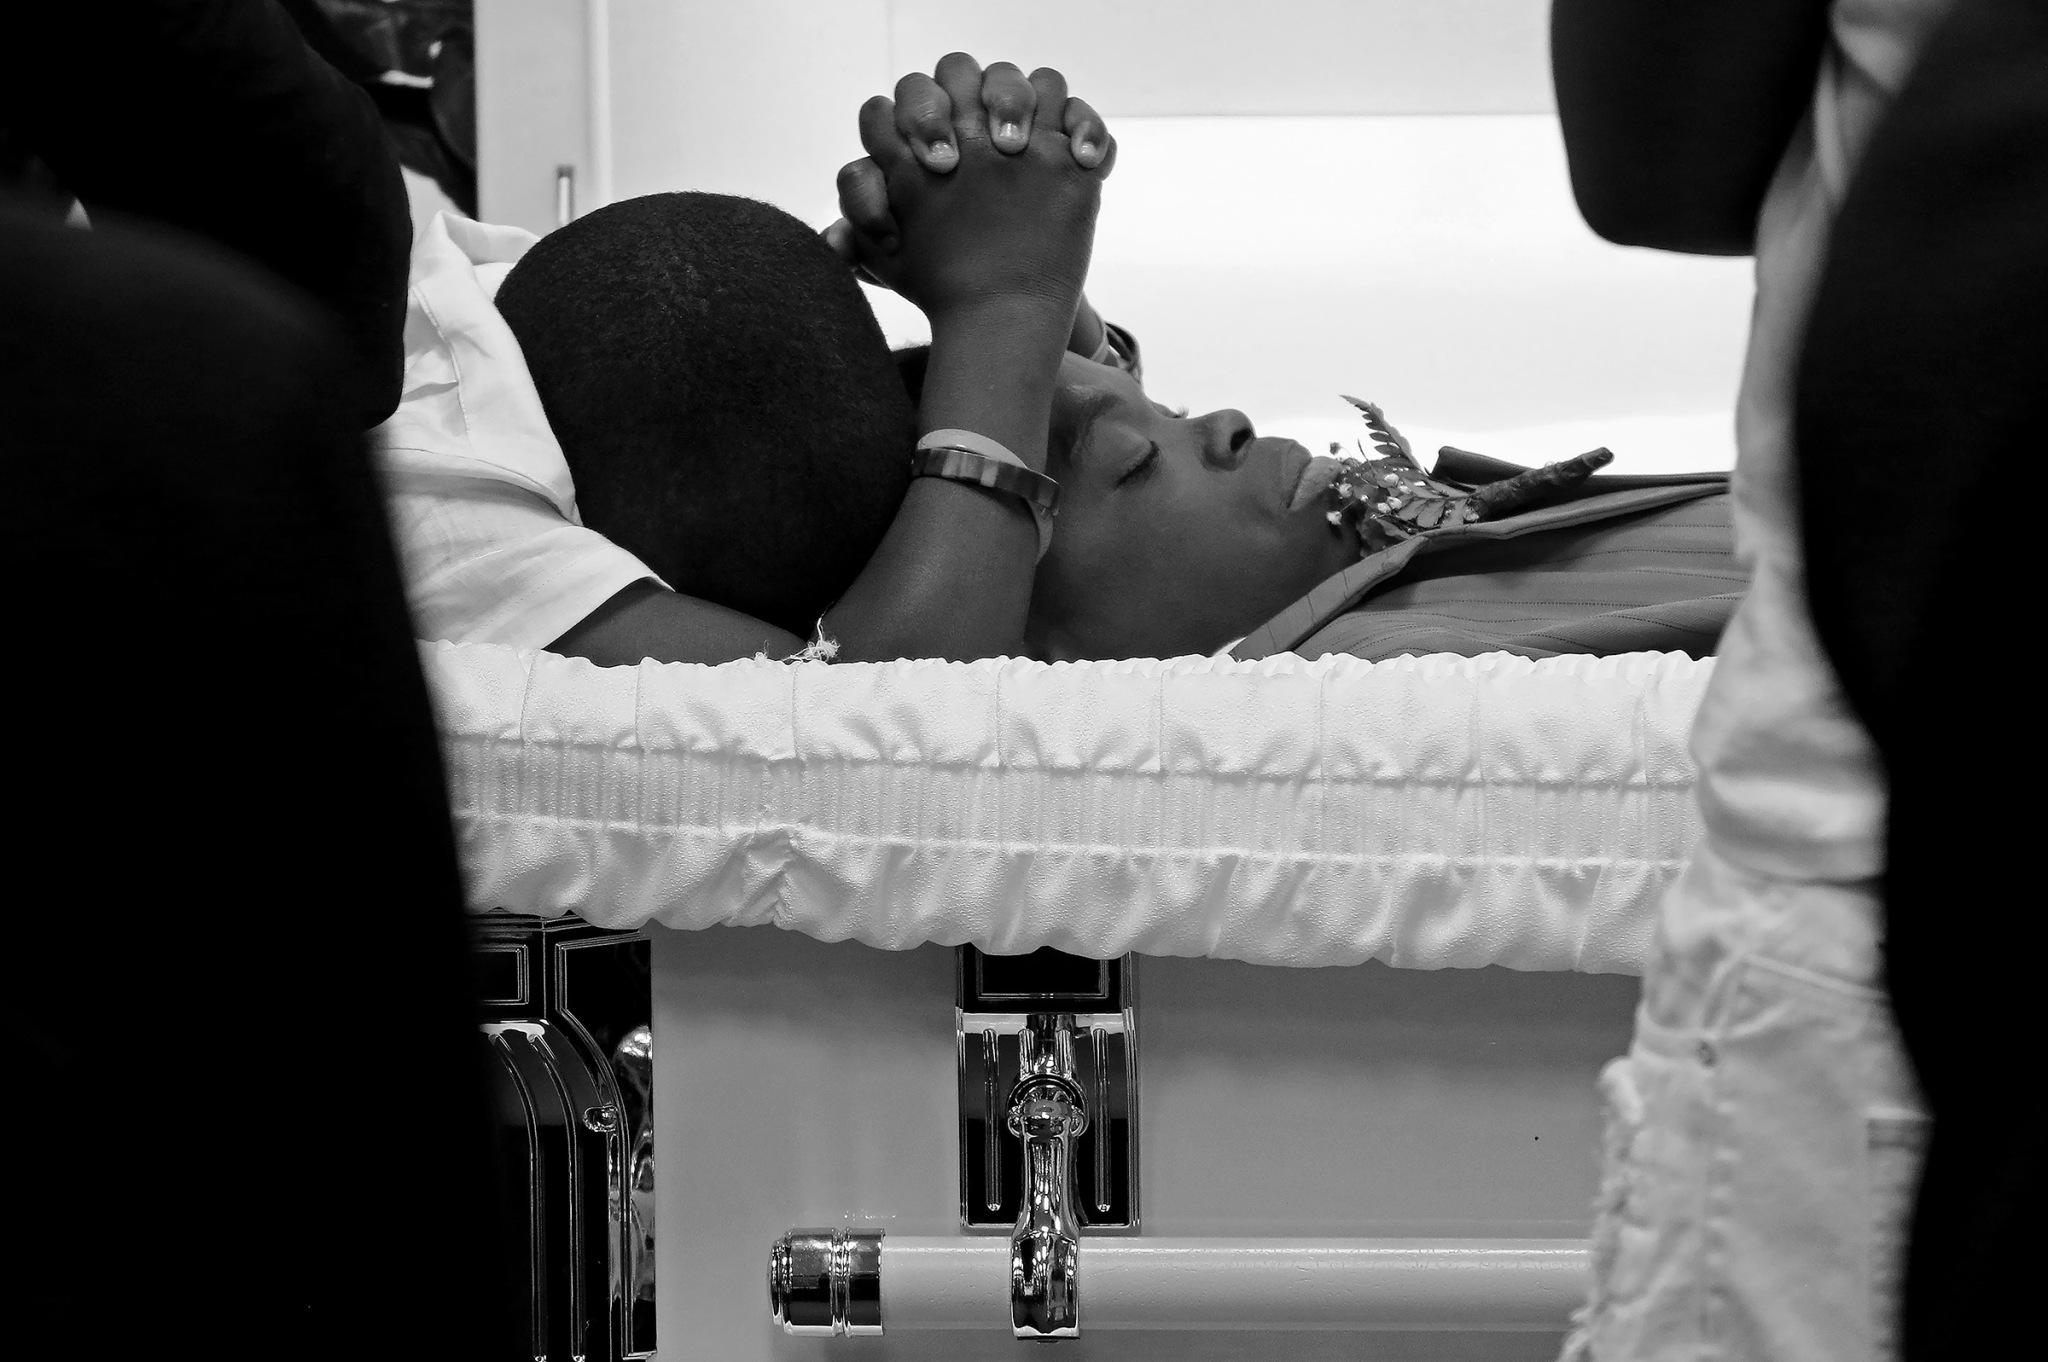 ct-Deshawn-Martin-funeral